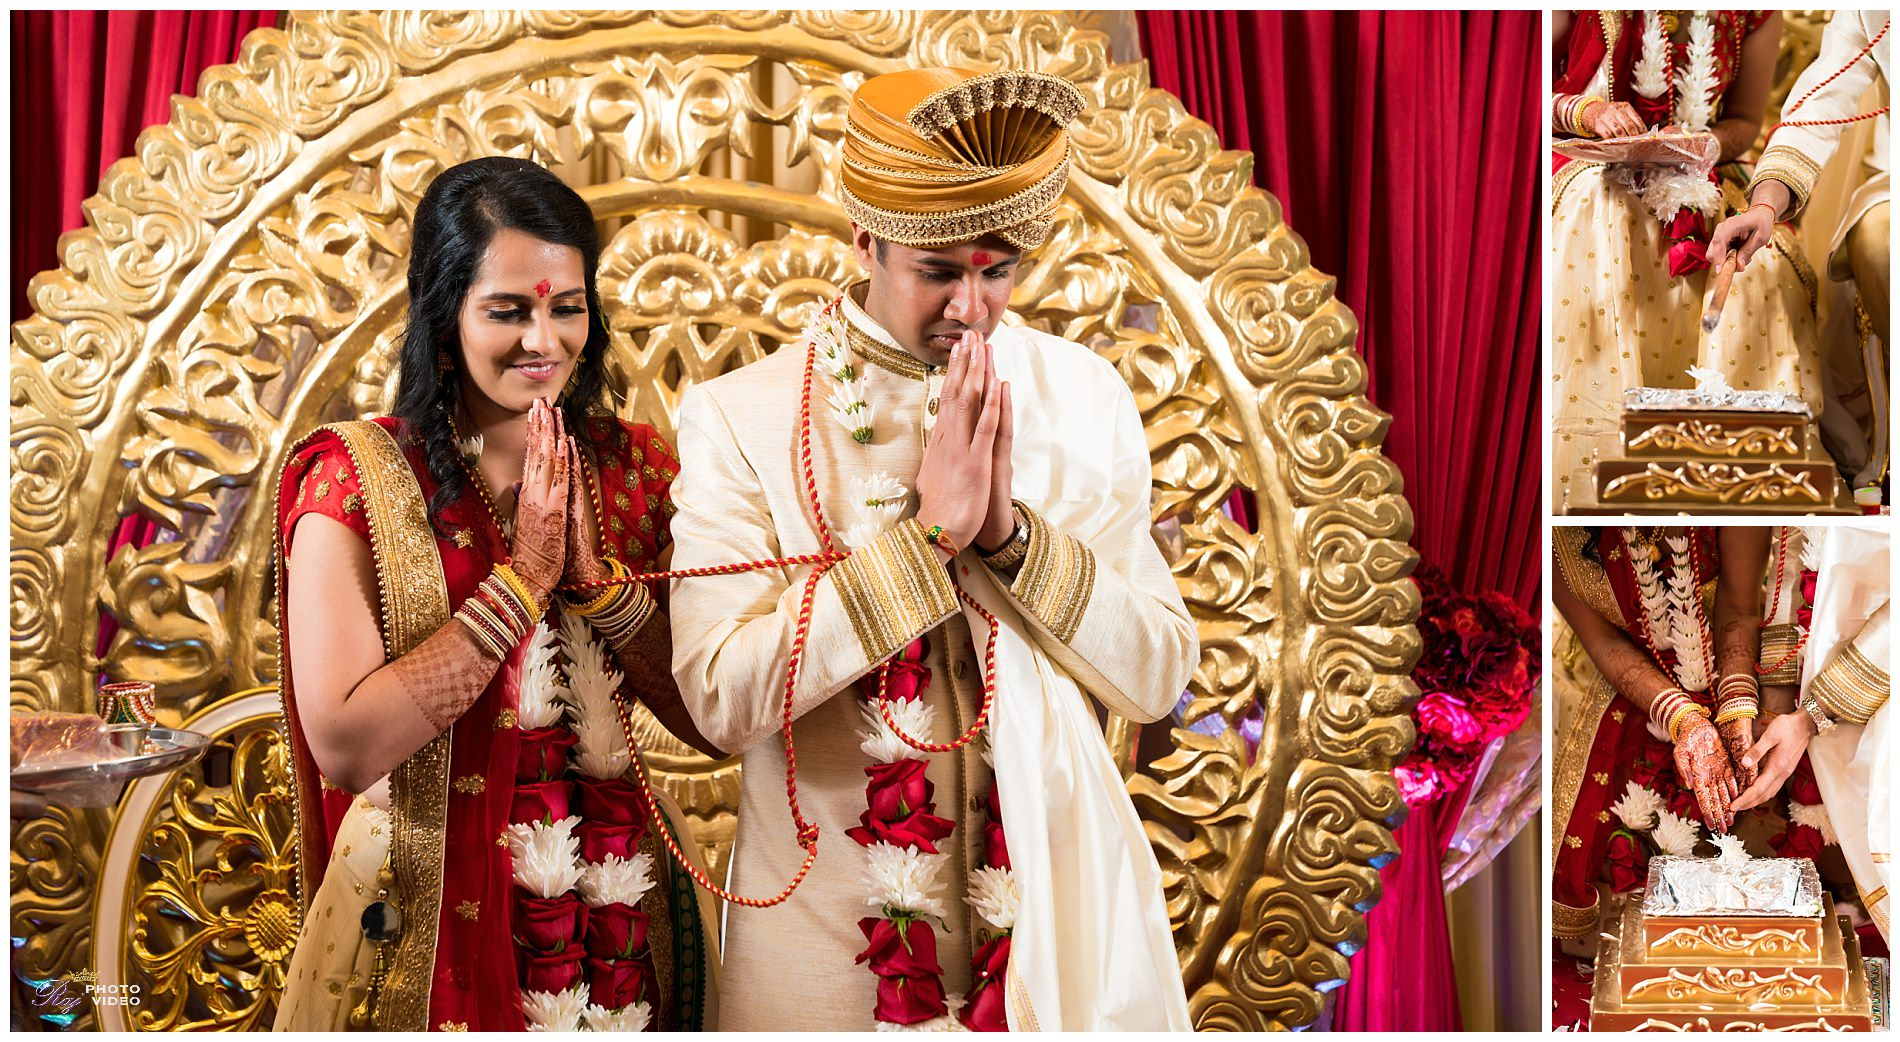 Martinsville-Gardens-NJ-Indian-Wedding-Ruchi-Vishal-29.jpg